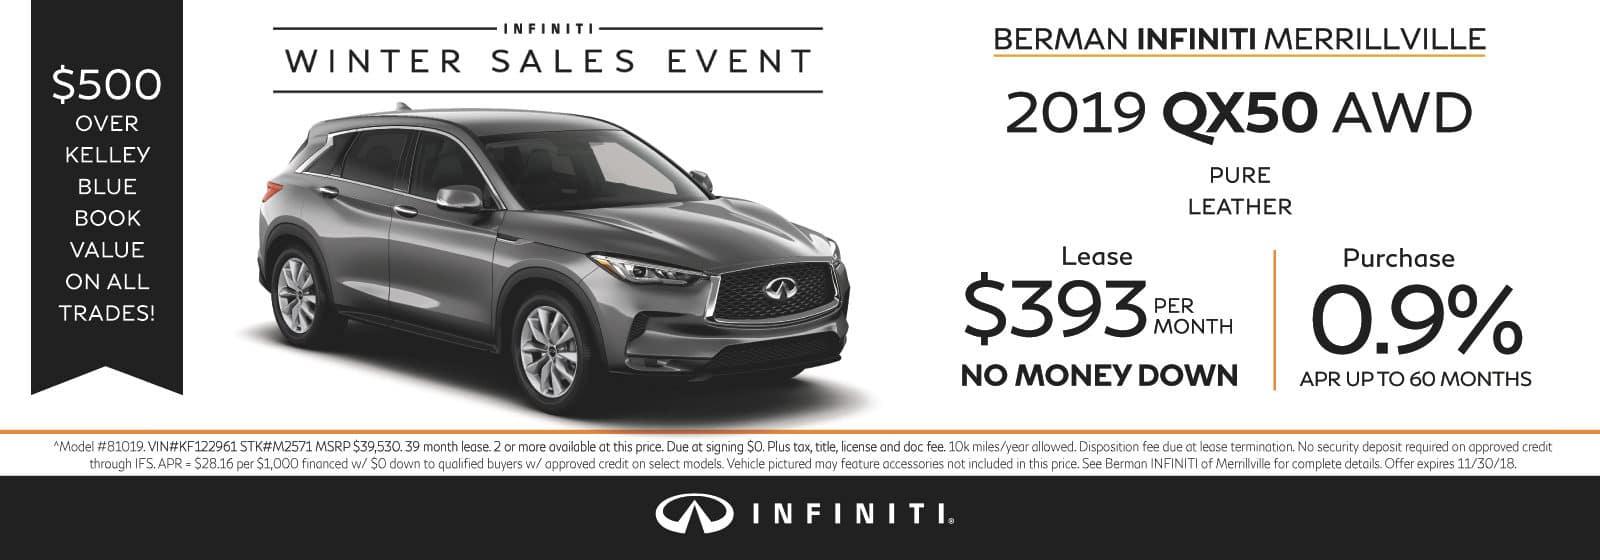 New 2019 INFINITI QX50 November Offer at Berman INFINITI of Merrillville!